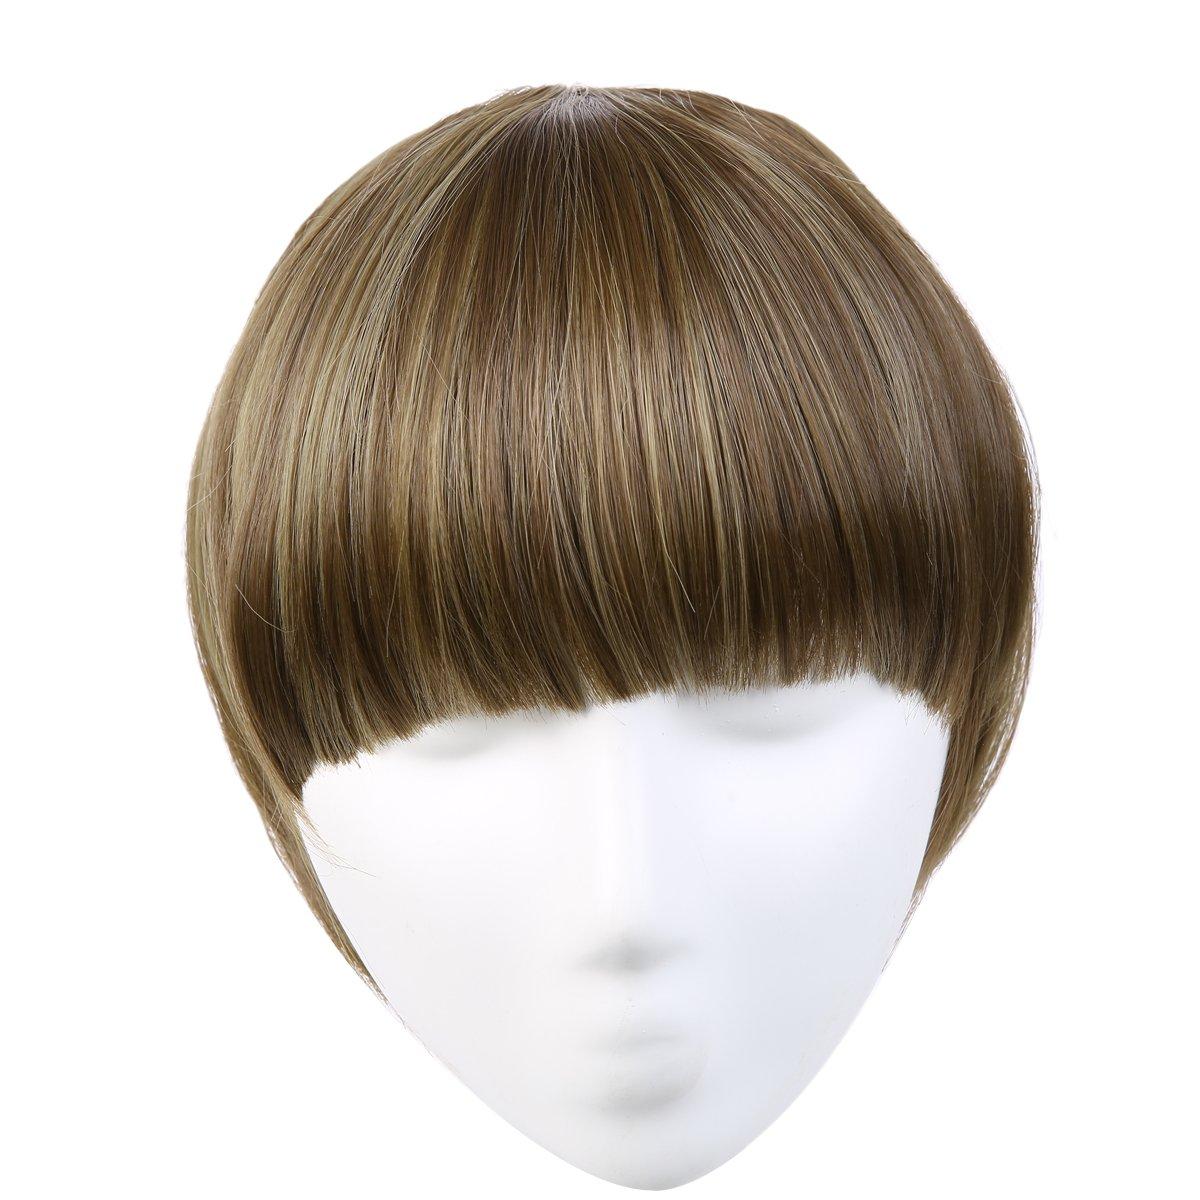 Amazon Sarla Synthetic Hairpieces False Bangs Hair Extensions